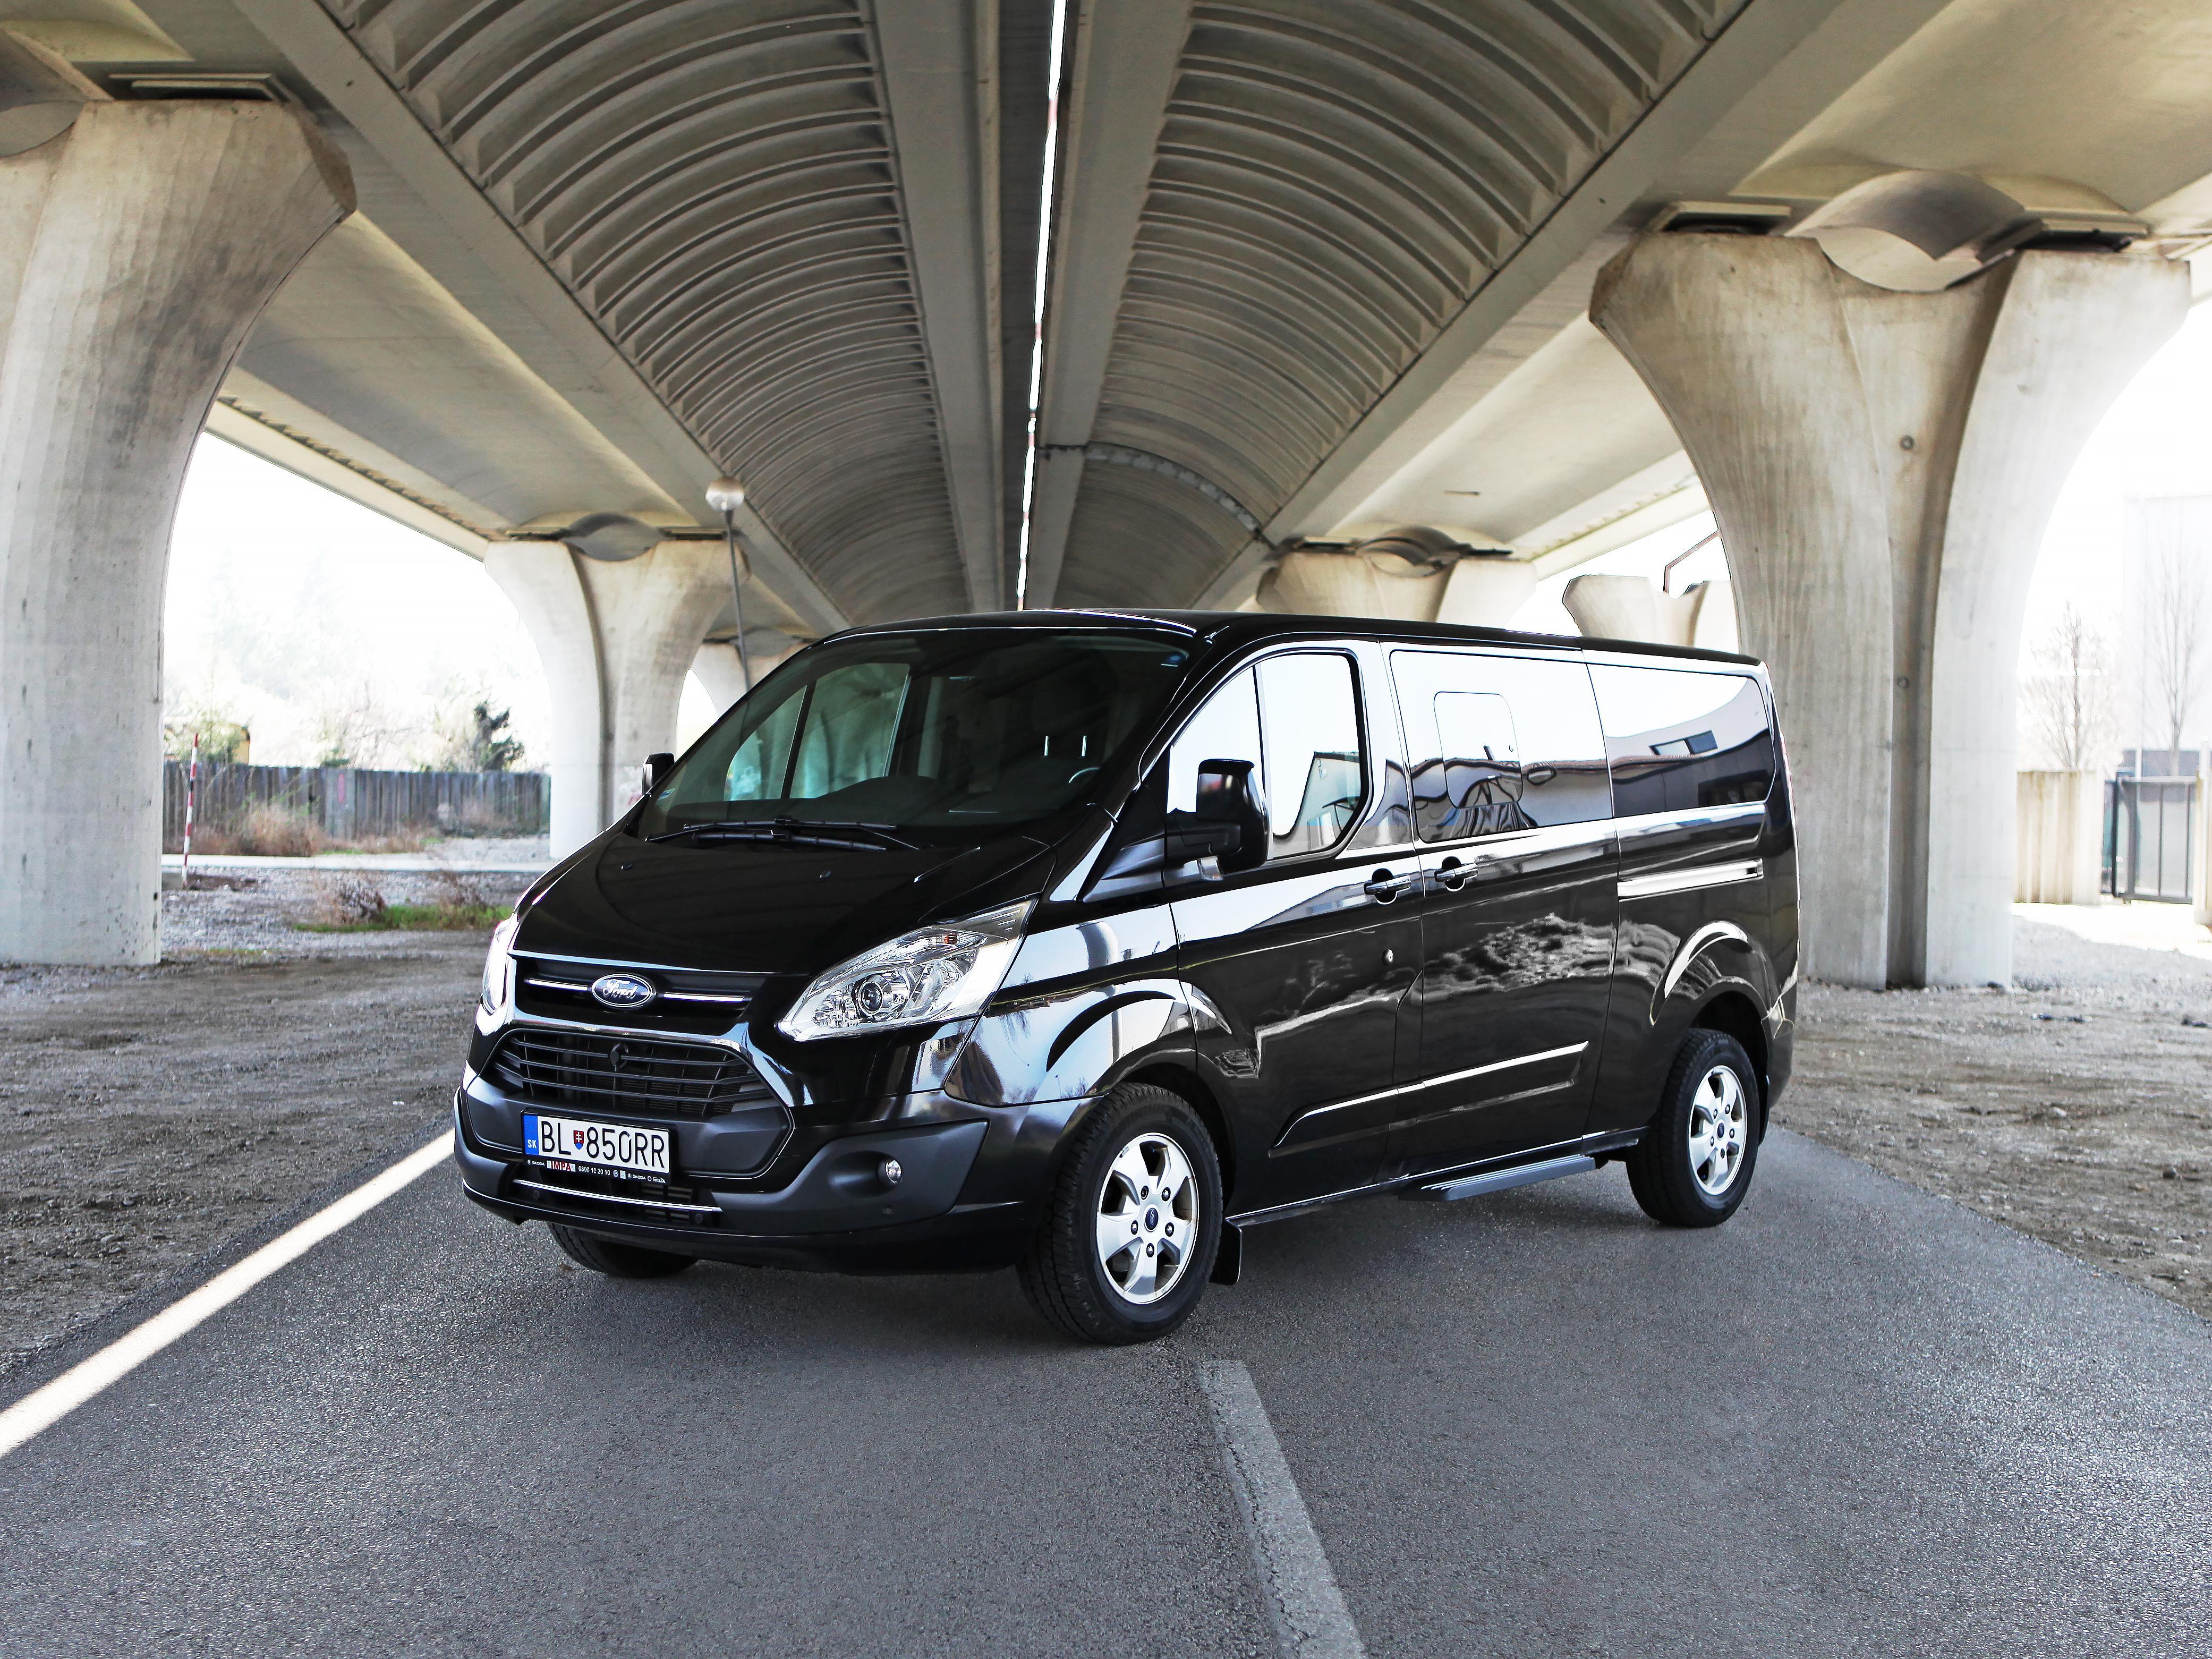 Ford Tourneo EcoBlue 2.0 TDCi